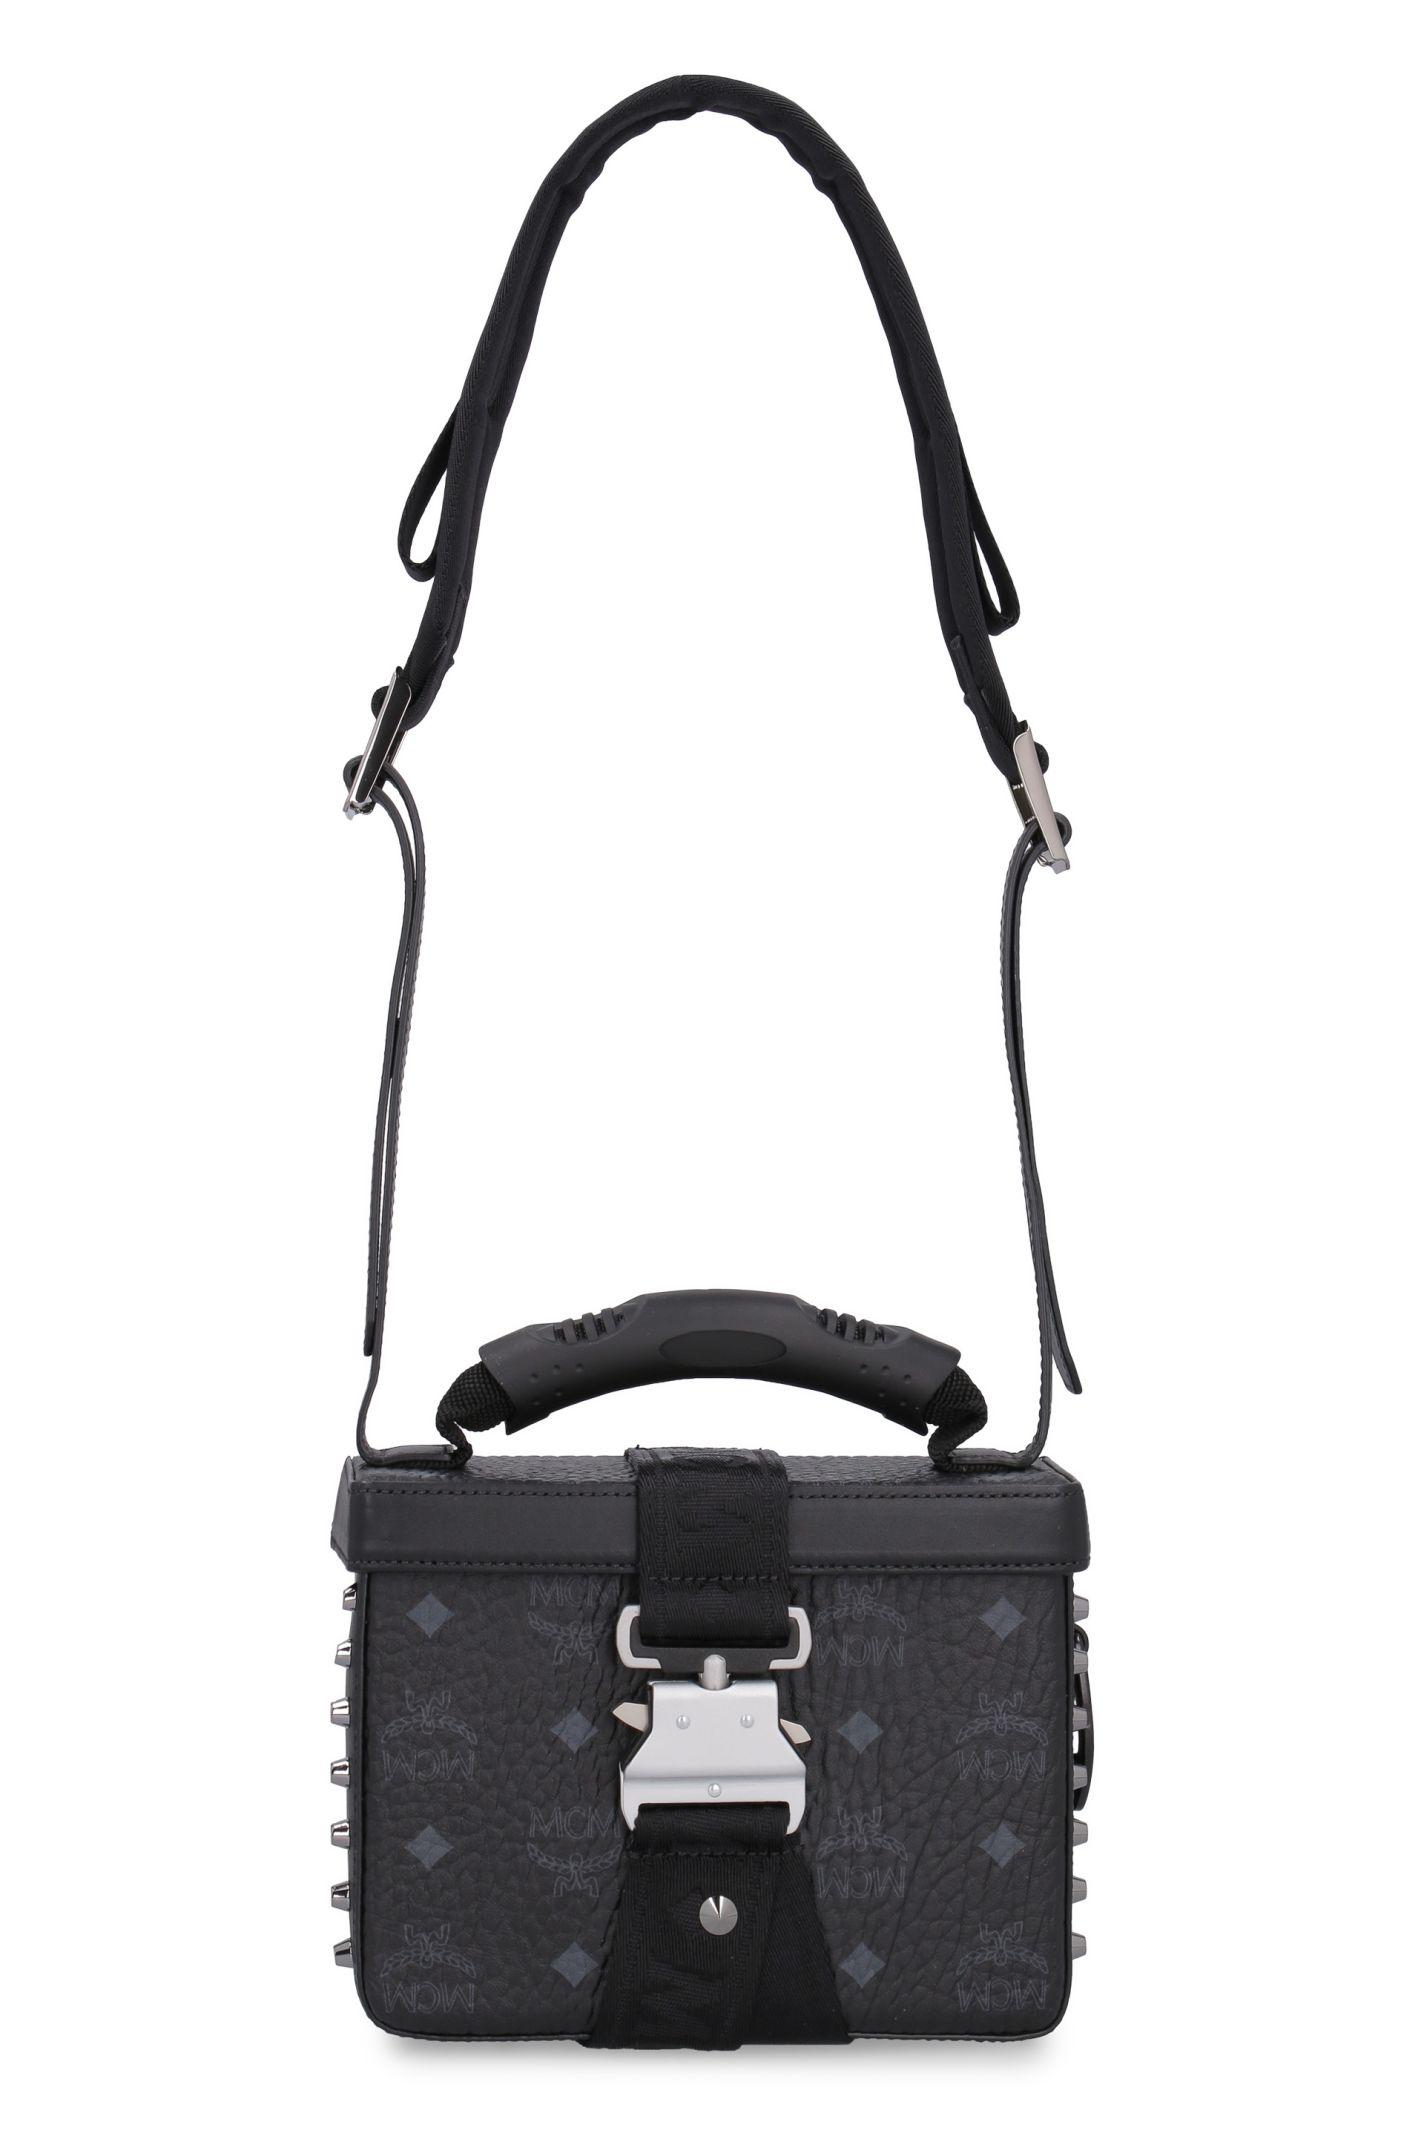 9601a6a0063e MCM MCM Jemison Crossbody Bag - black - 10878333 | italist